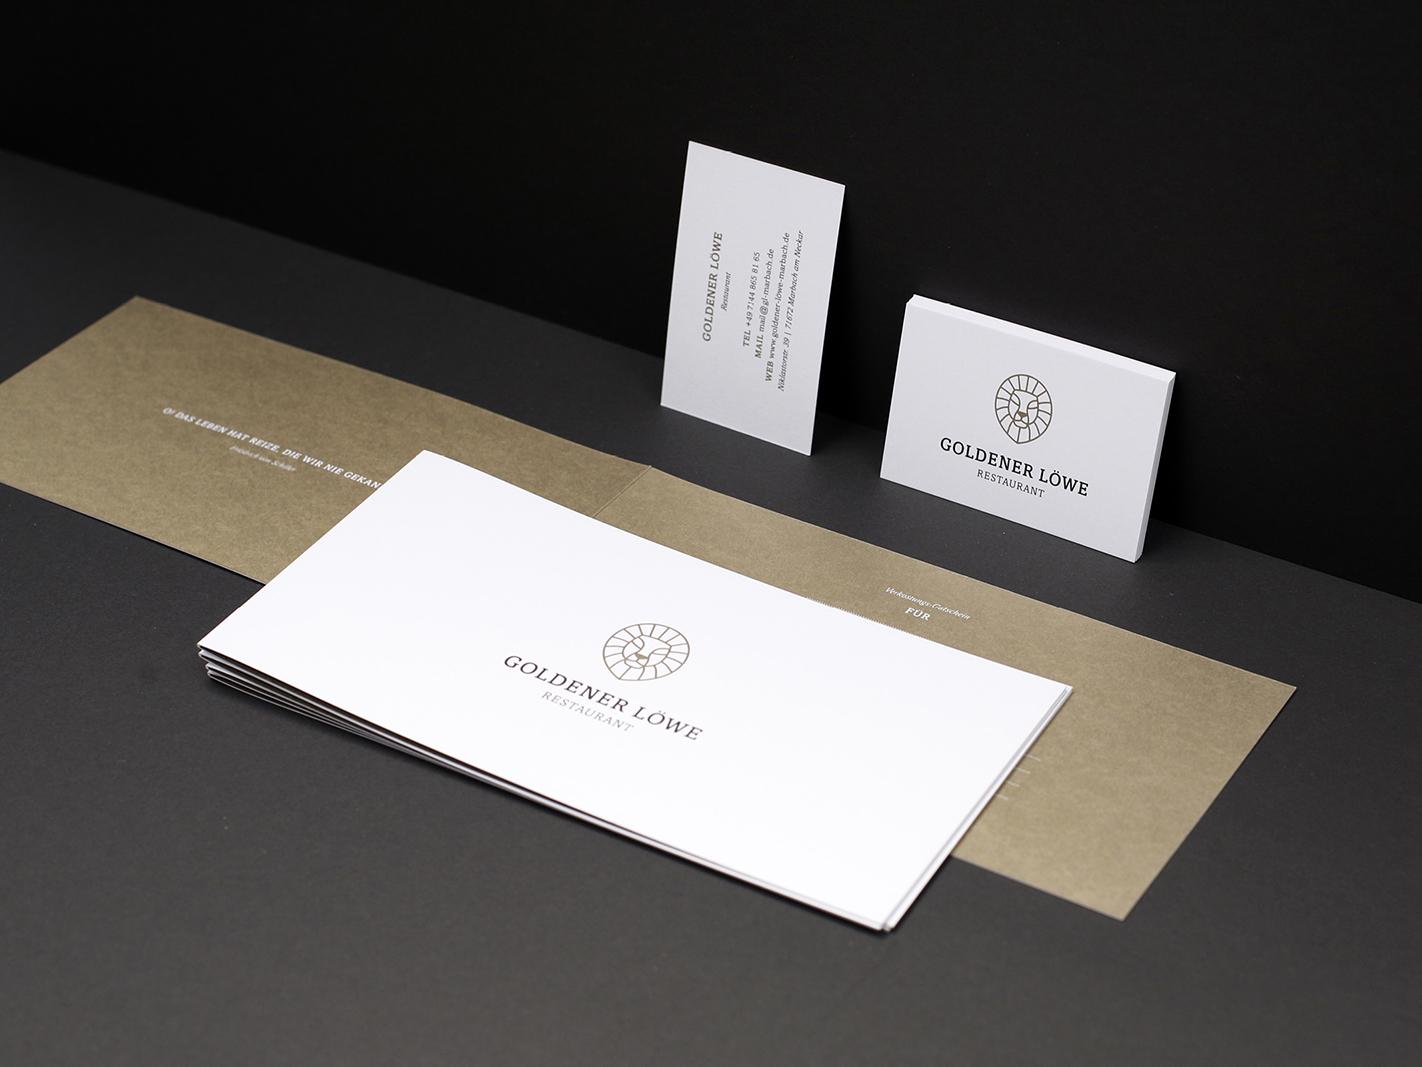 ATK-GOLDENER-LOEWE-RESTAURANT-Corporate-Design-6.jpg